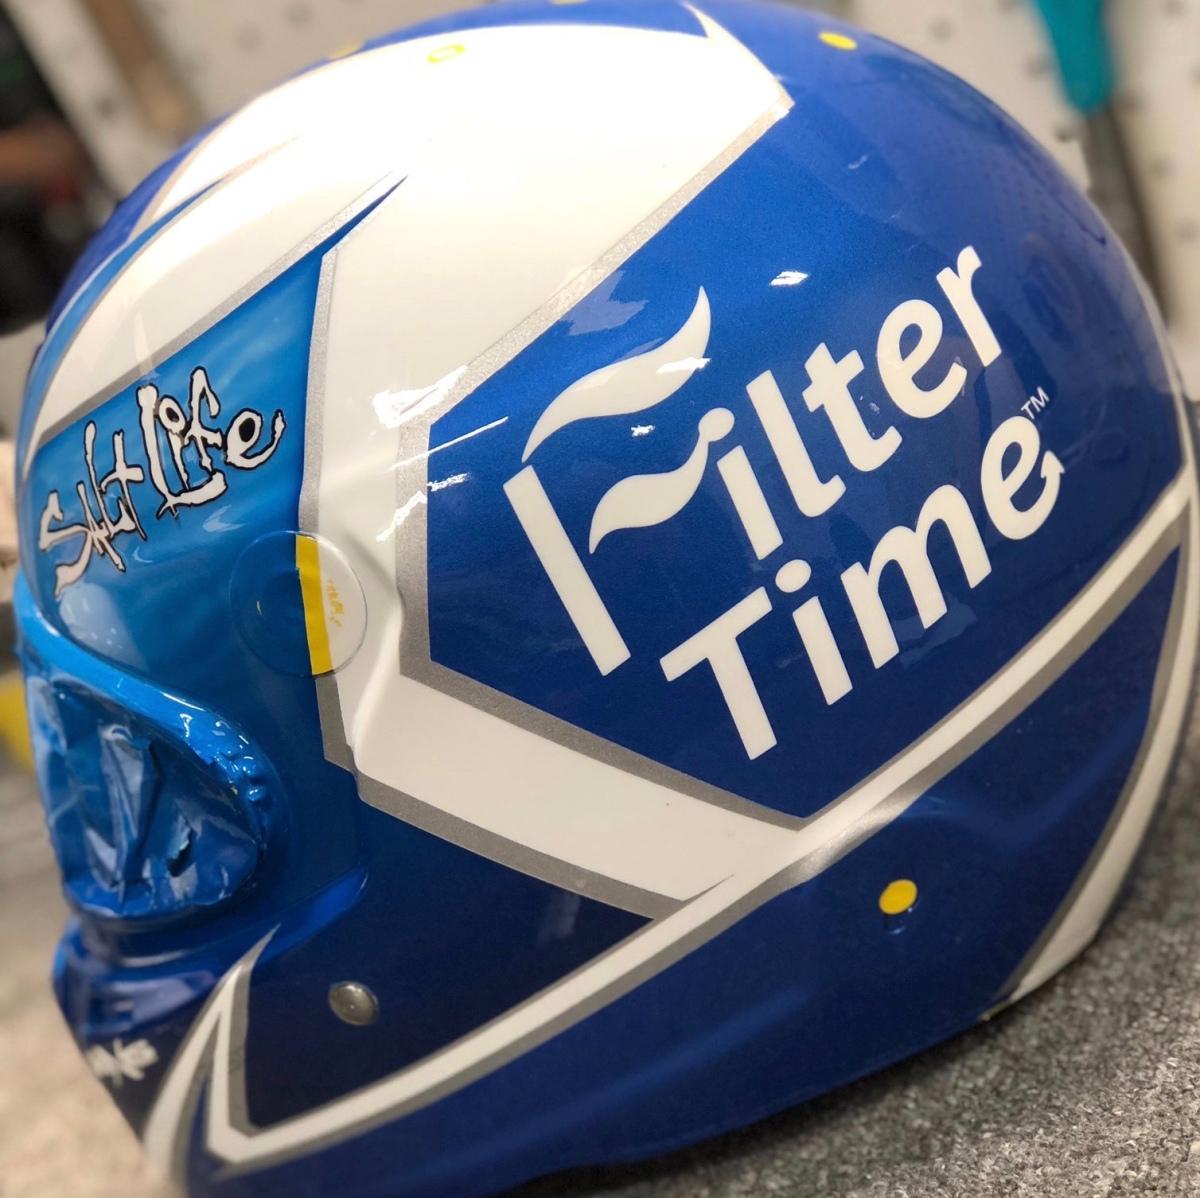 """I'll make my own sponsor."" Blake Koch's answer to a NASCAR Dilemma"